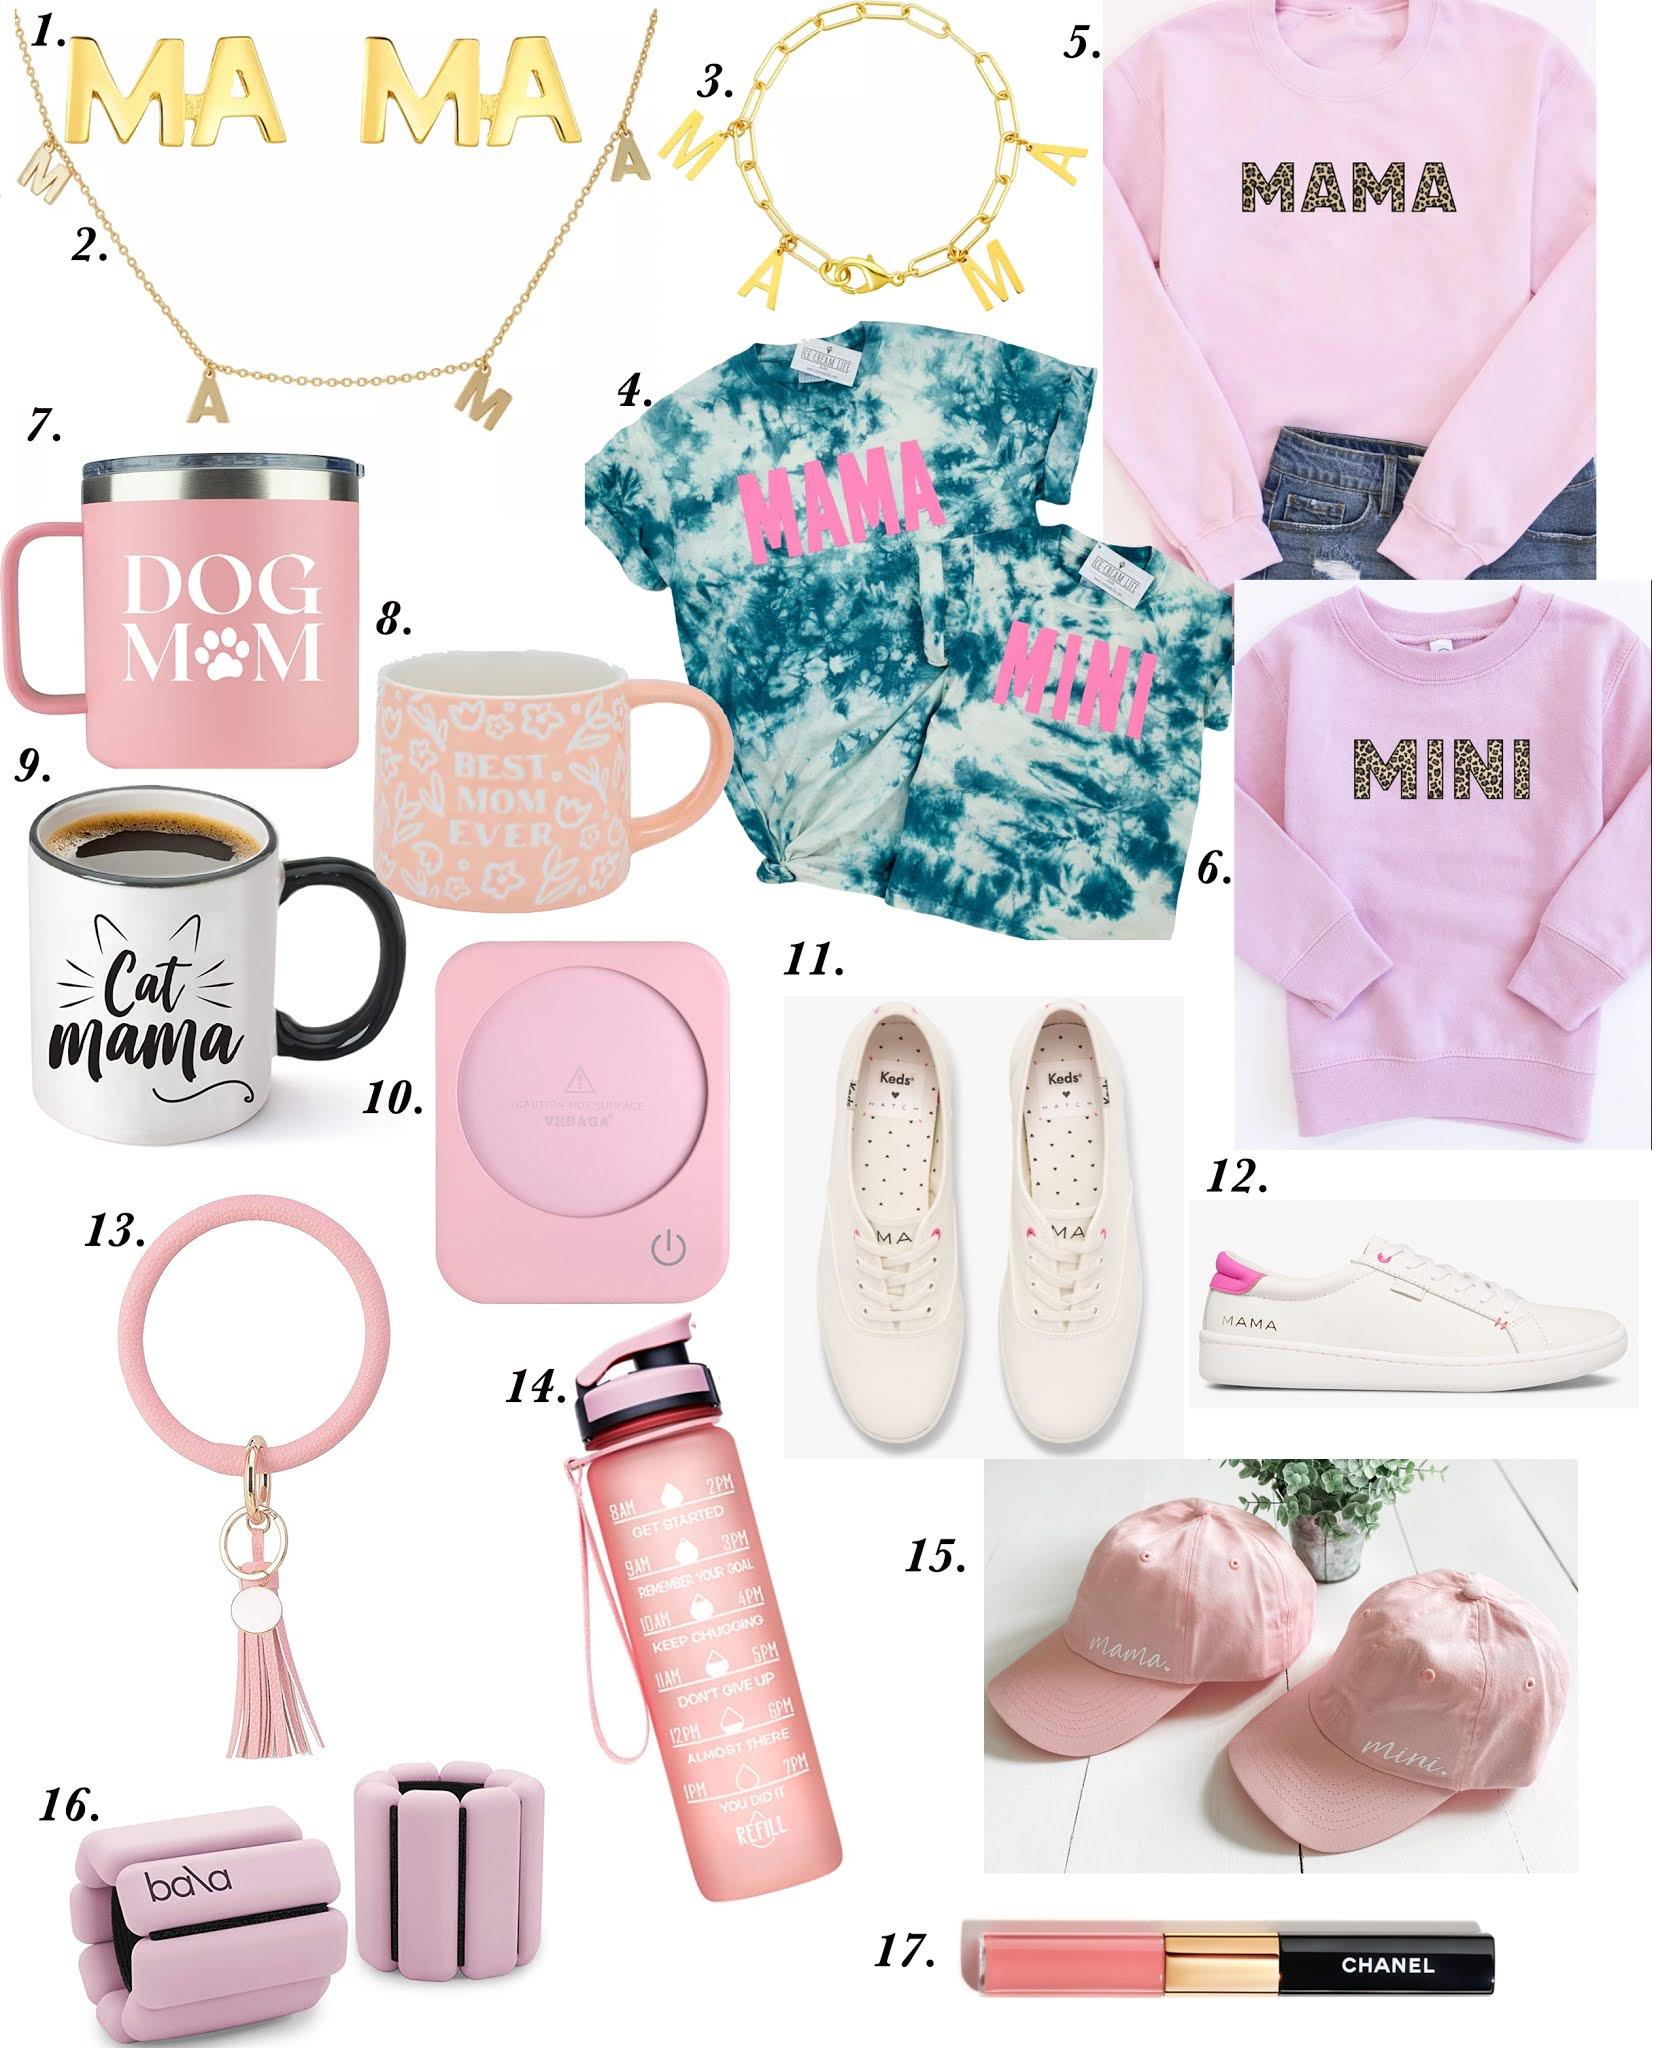 Mother's Day Favorites & Gift Ideas - Something Delightful Blog #MothersDay #GiftsforMoms #MamaItems #MamaSweatshirt #ItemsforMomLife